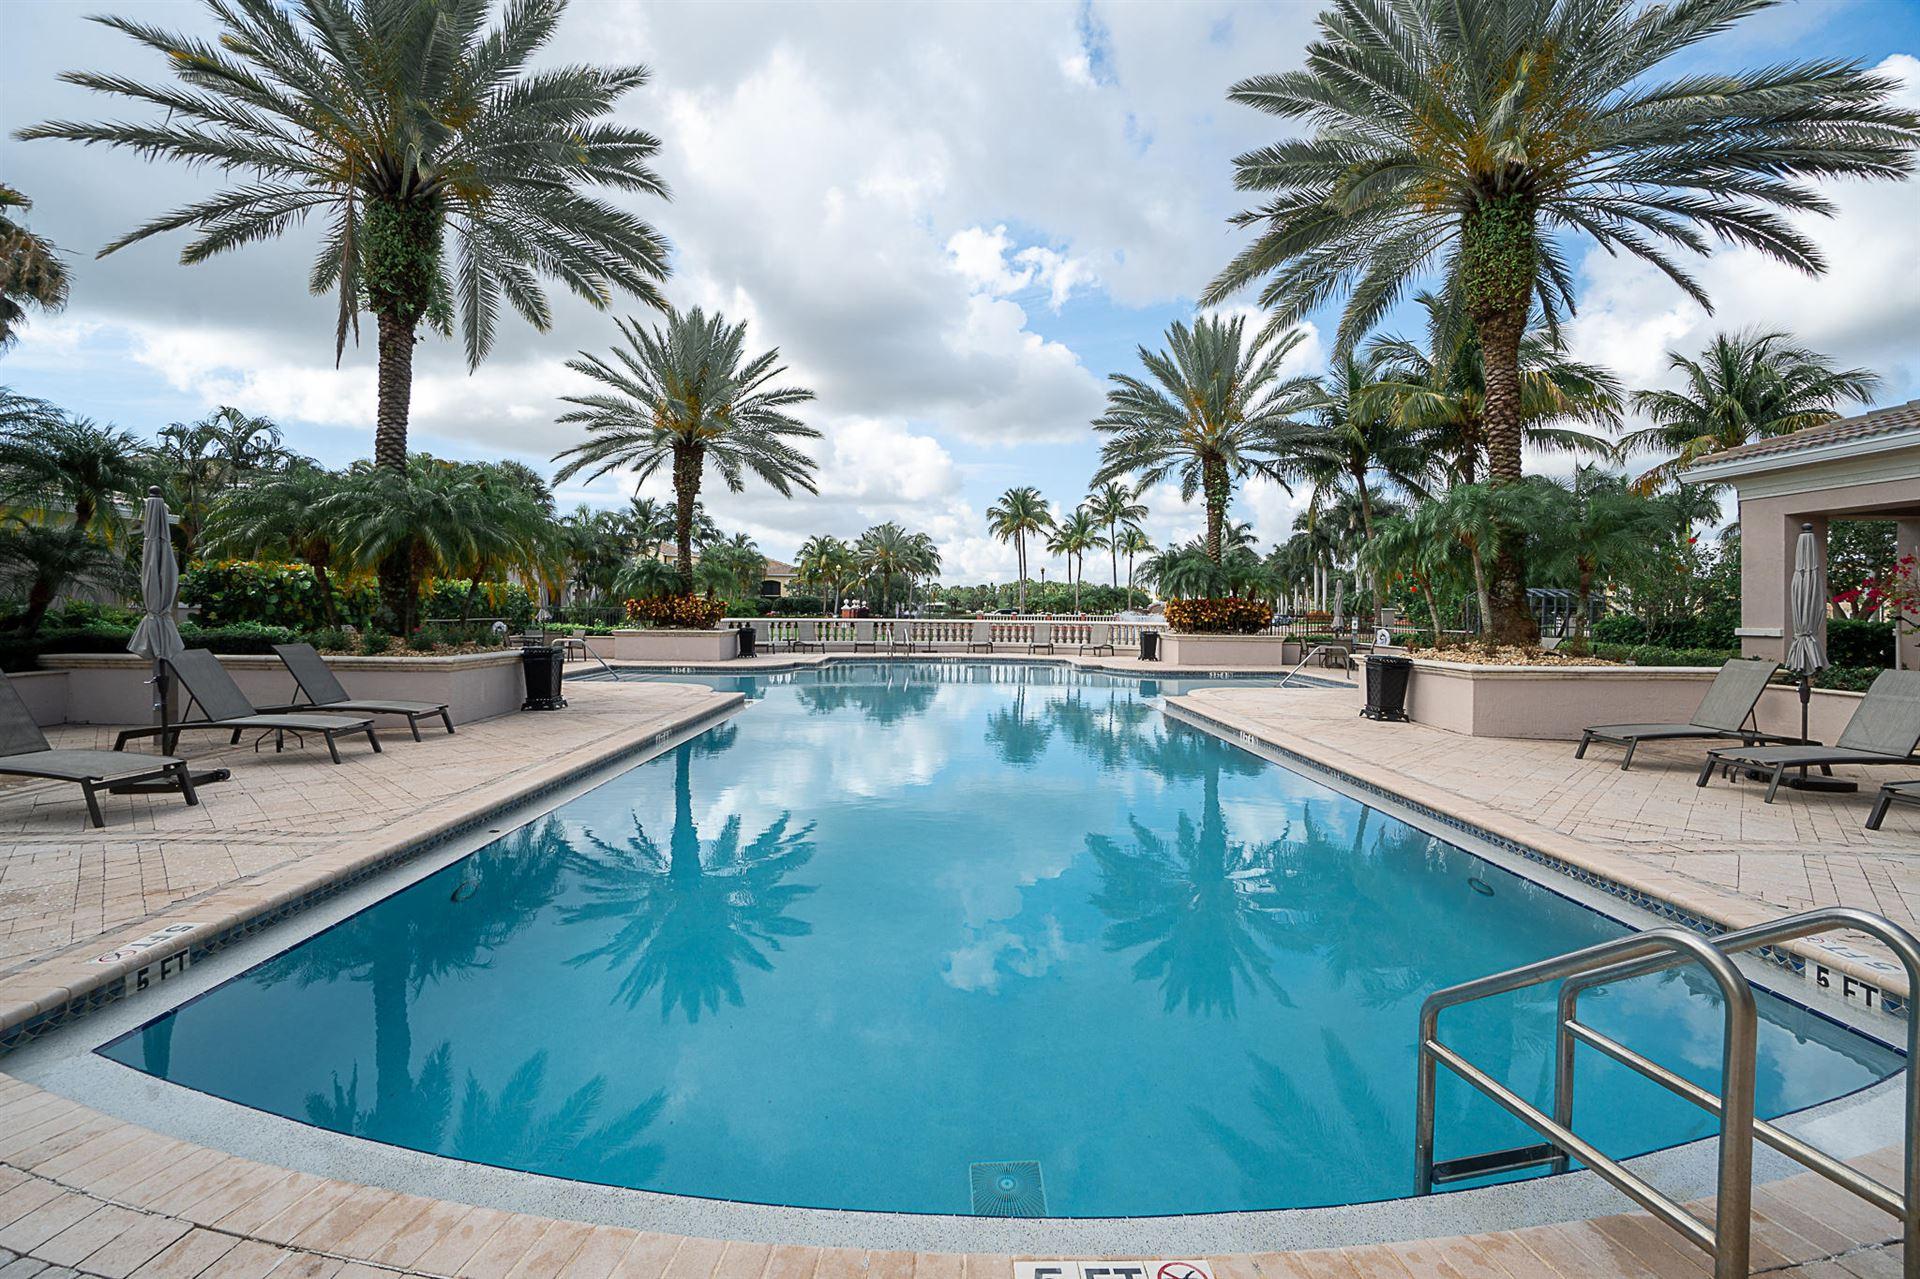 Photo of 2729 Anzio Court #101, Palm Beach Gardens, FL 33410 (MLS # RX-10716060)